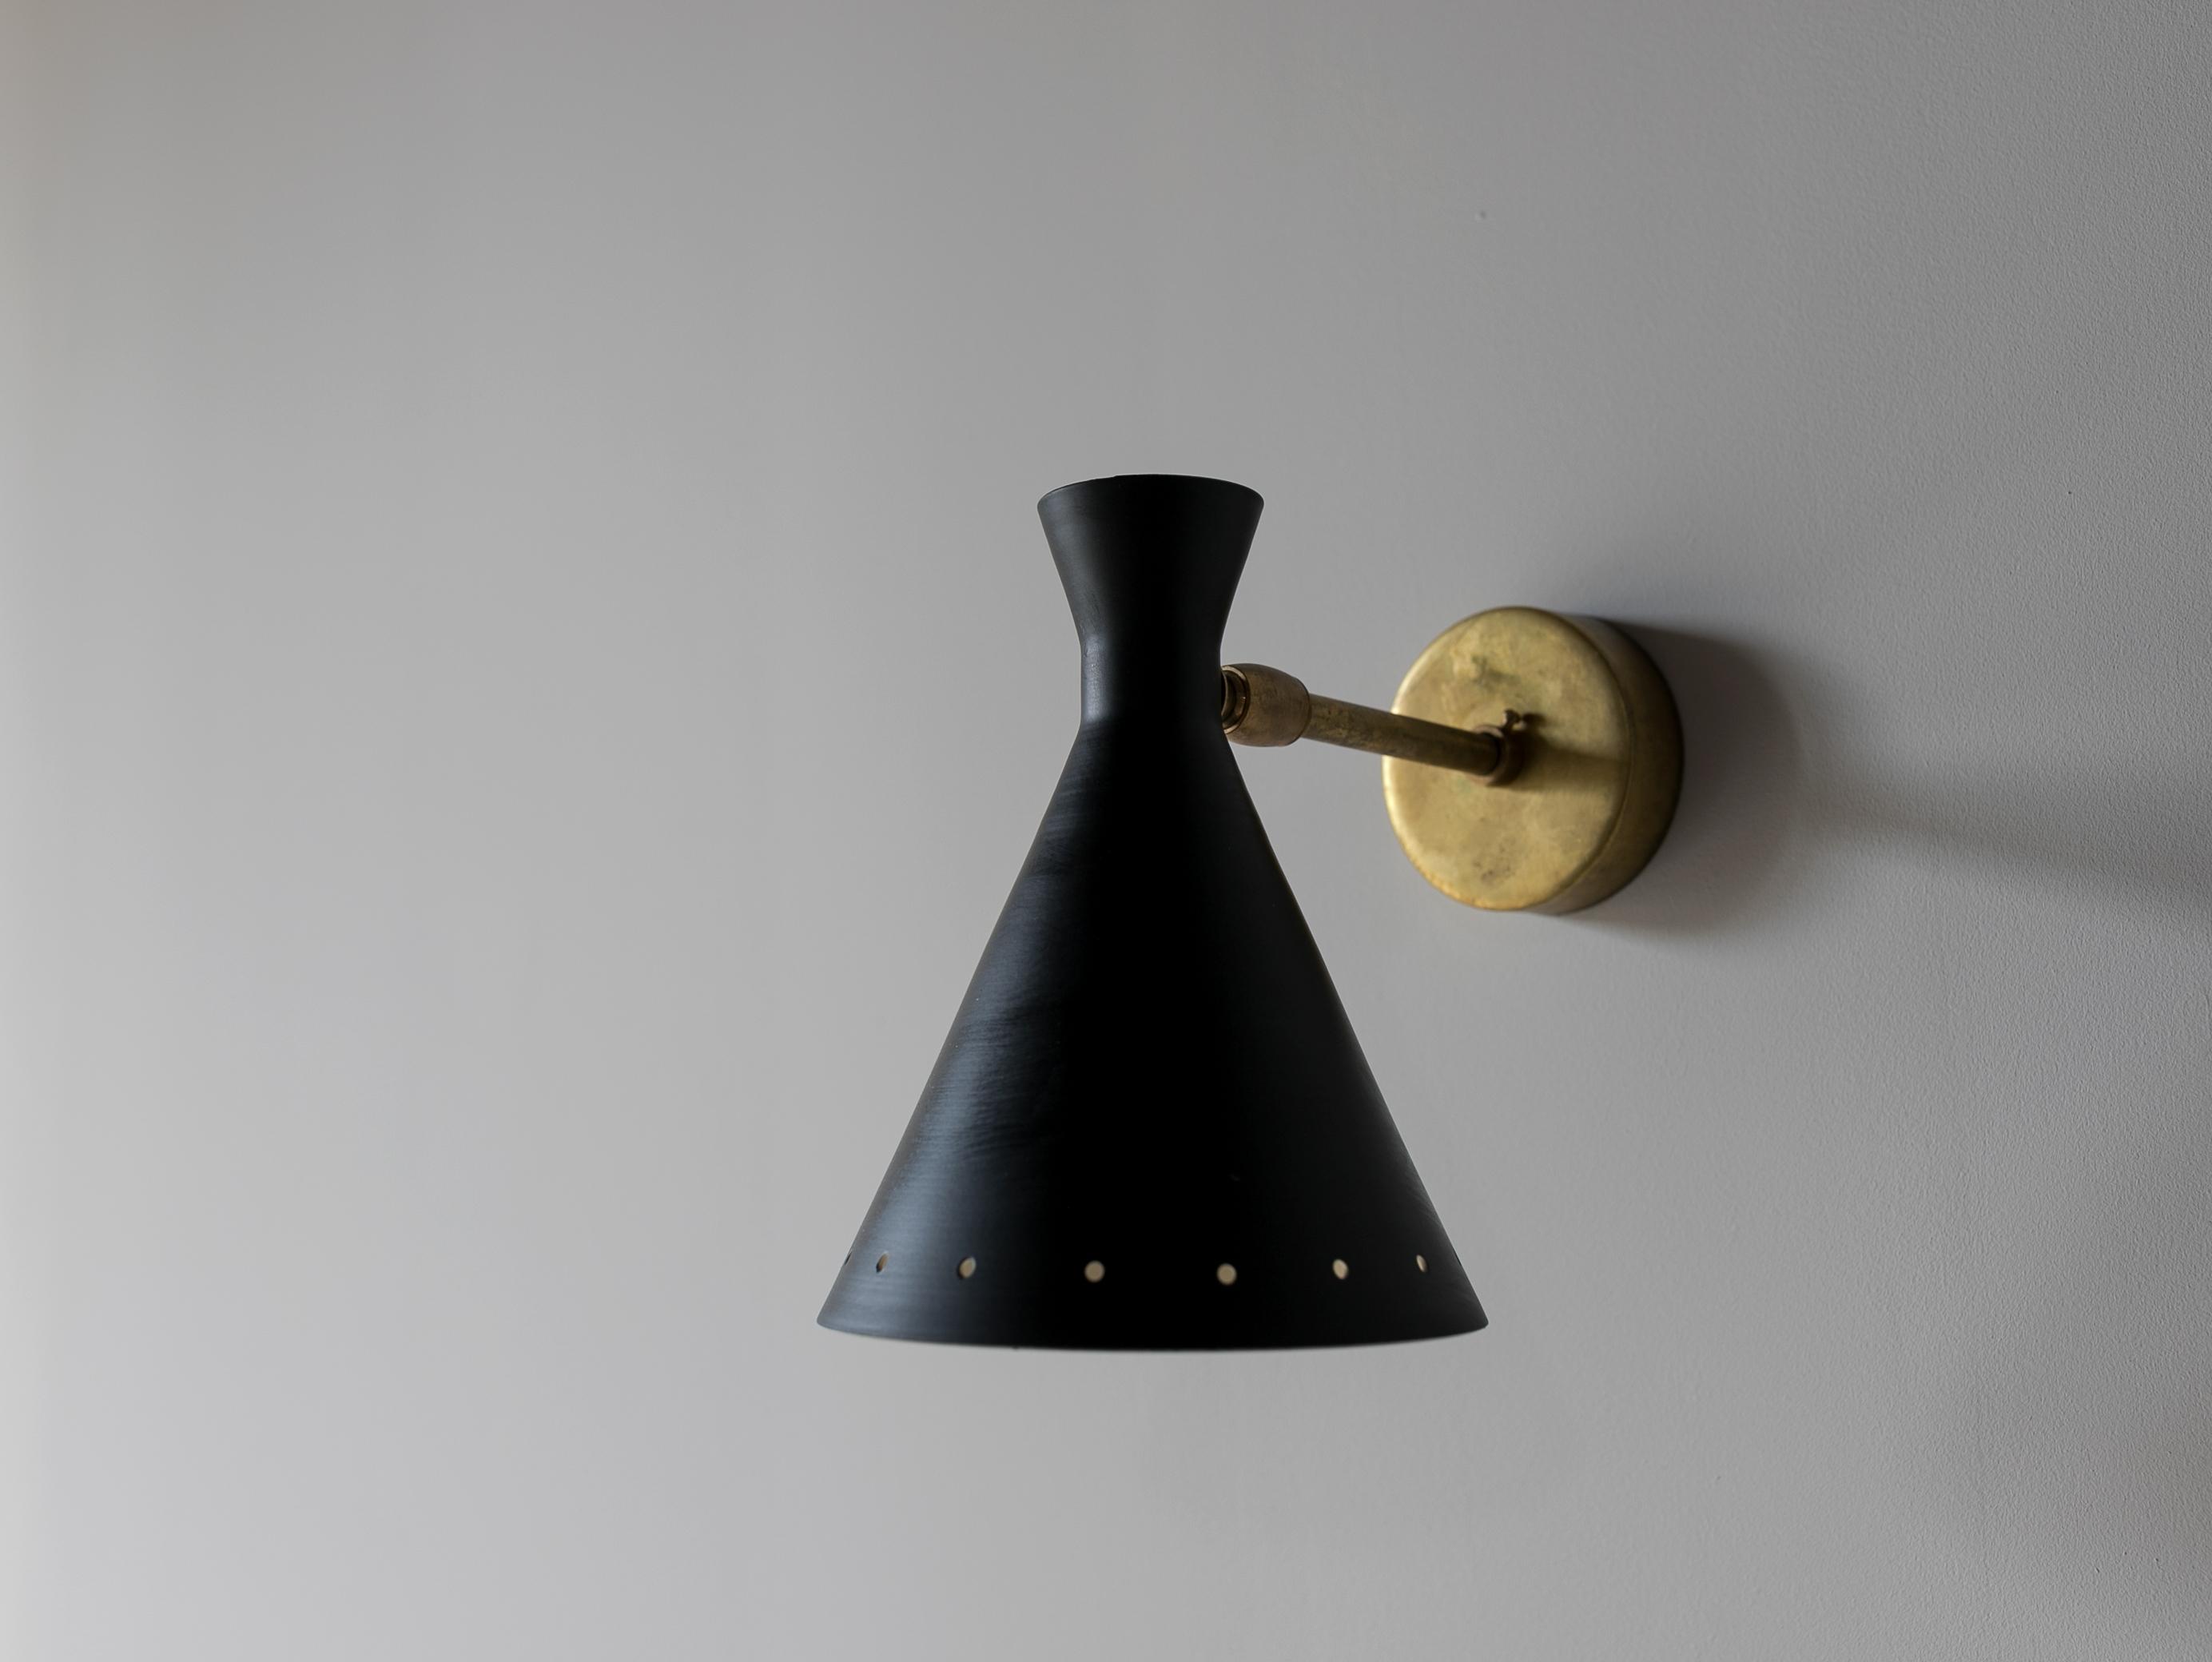 Vintage Black Cone Sconce l ビンテージウォールライト